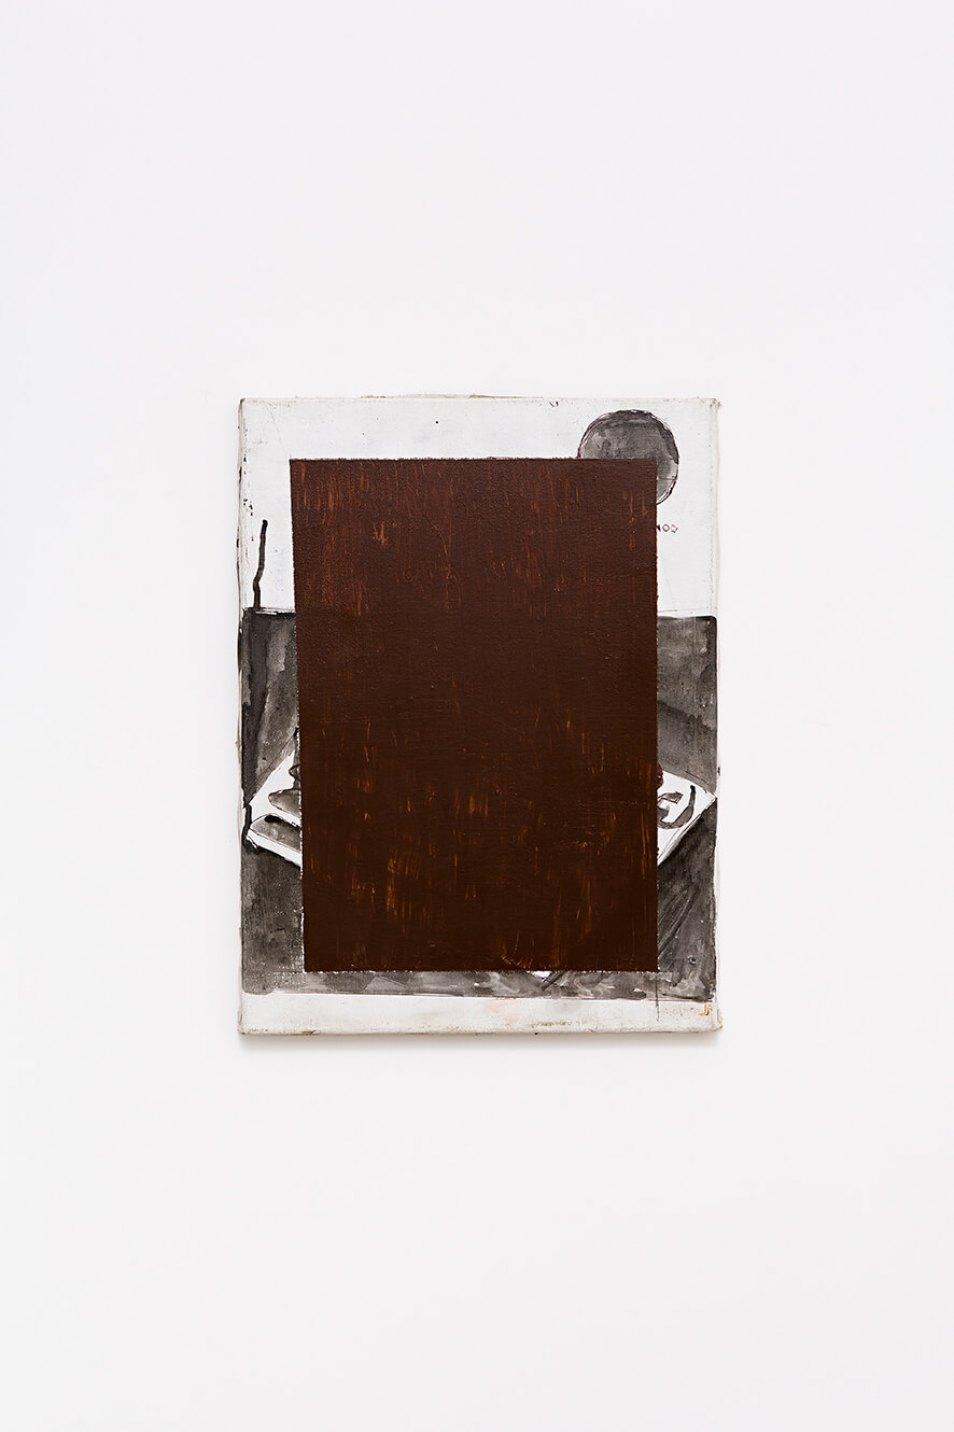 Deyson Gilbert,<em>untitled</em>, 2013,acrylic and synthetic enamel, 41 ×30 × 2cm - Mendes Wood DM